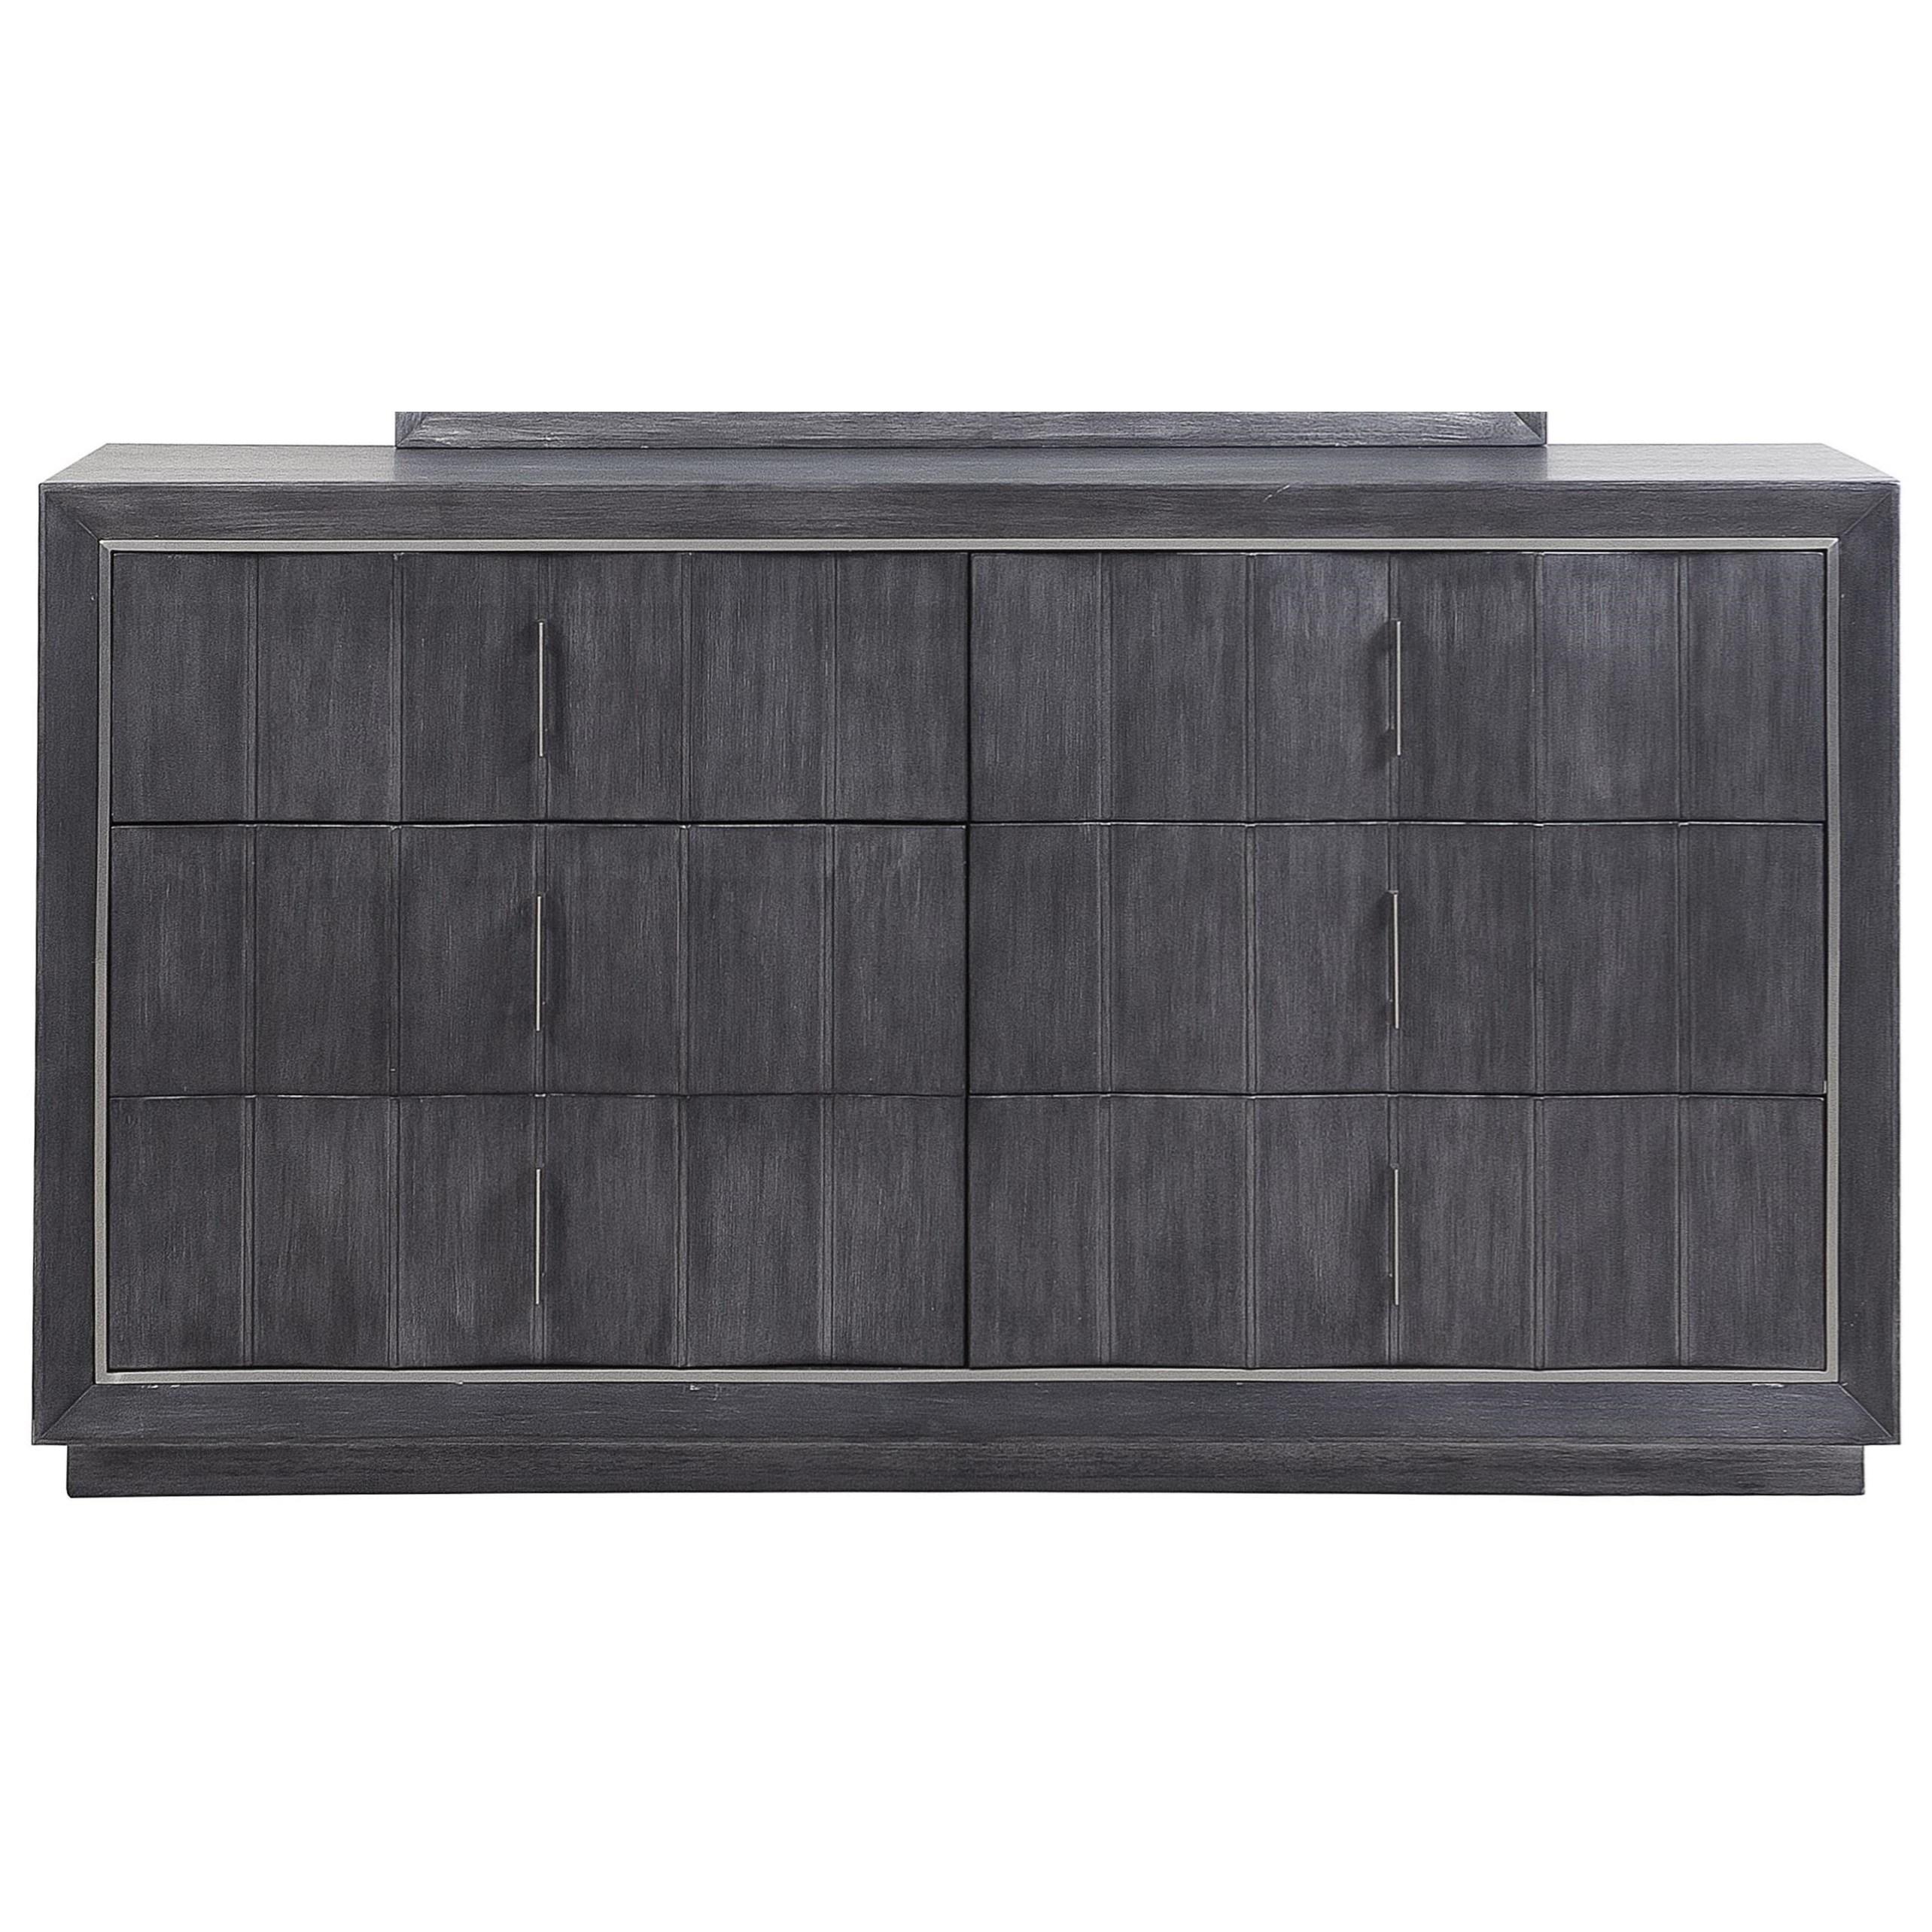 Echo Dresser by Pulaski Furniture at Carolina Direct